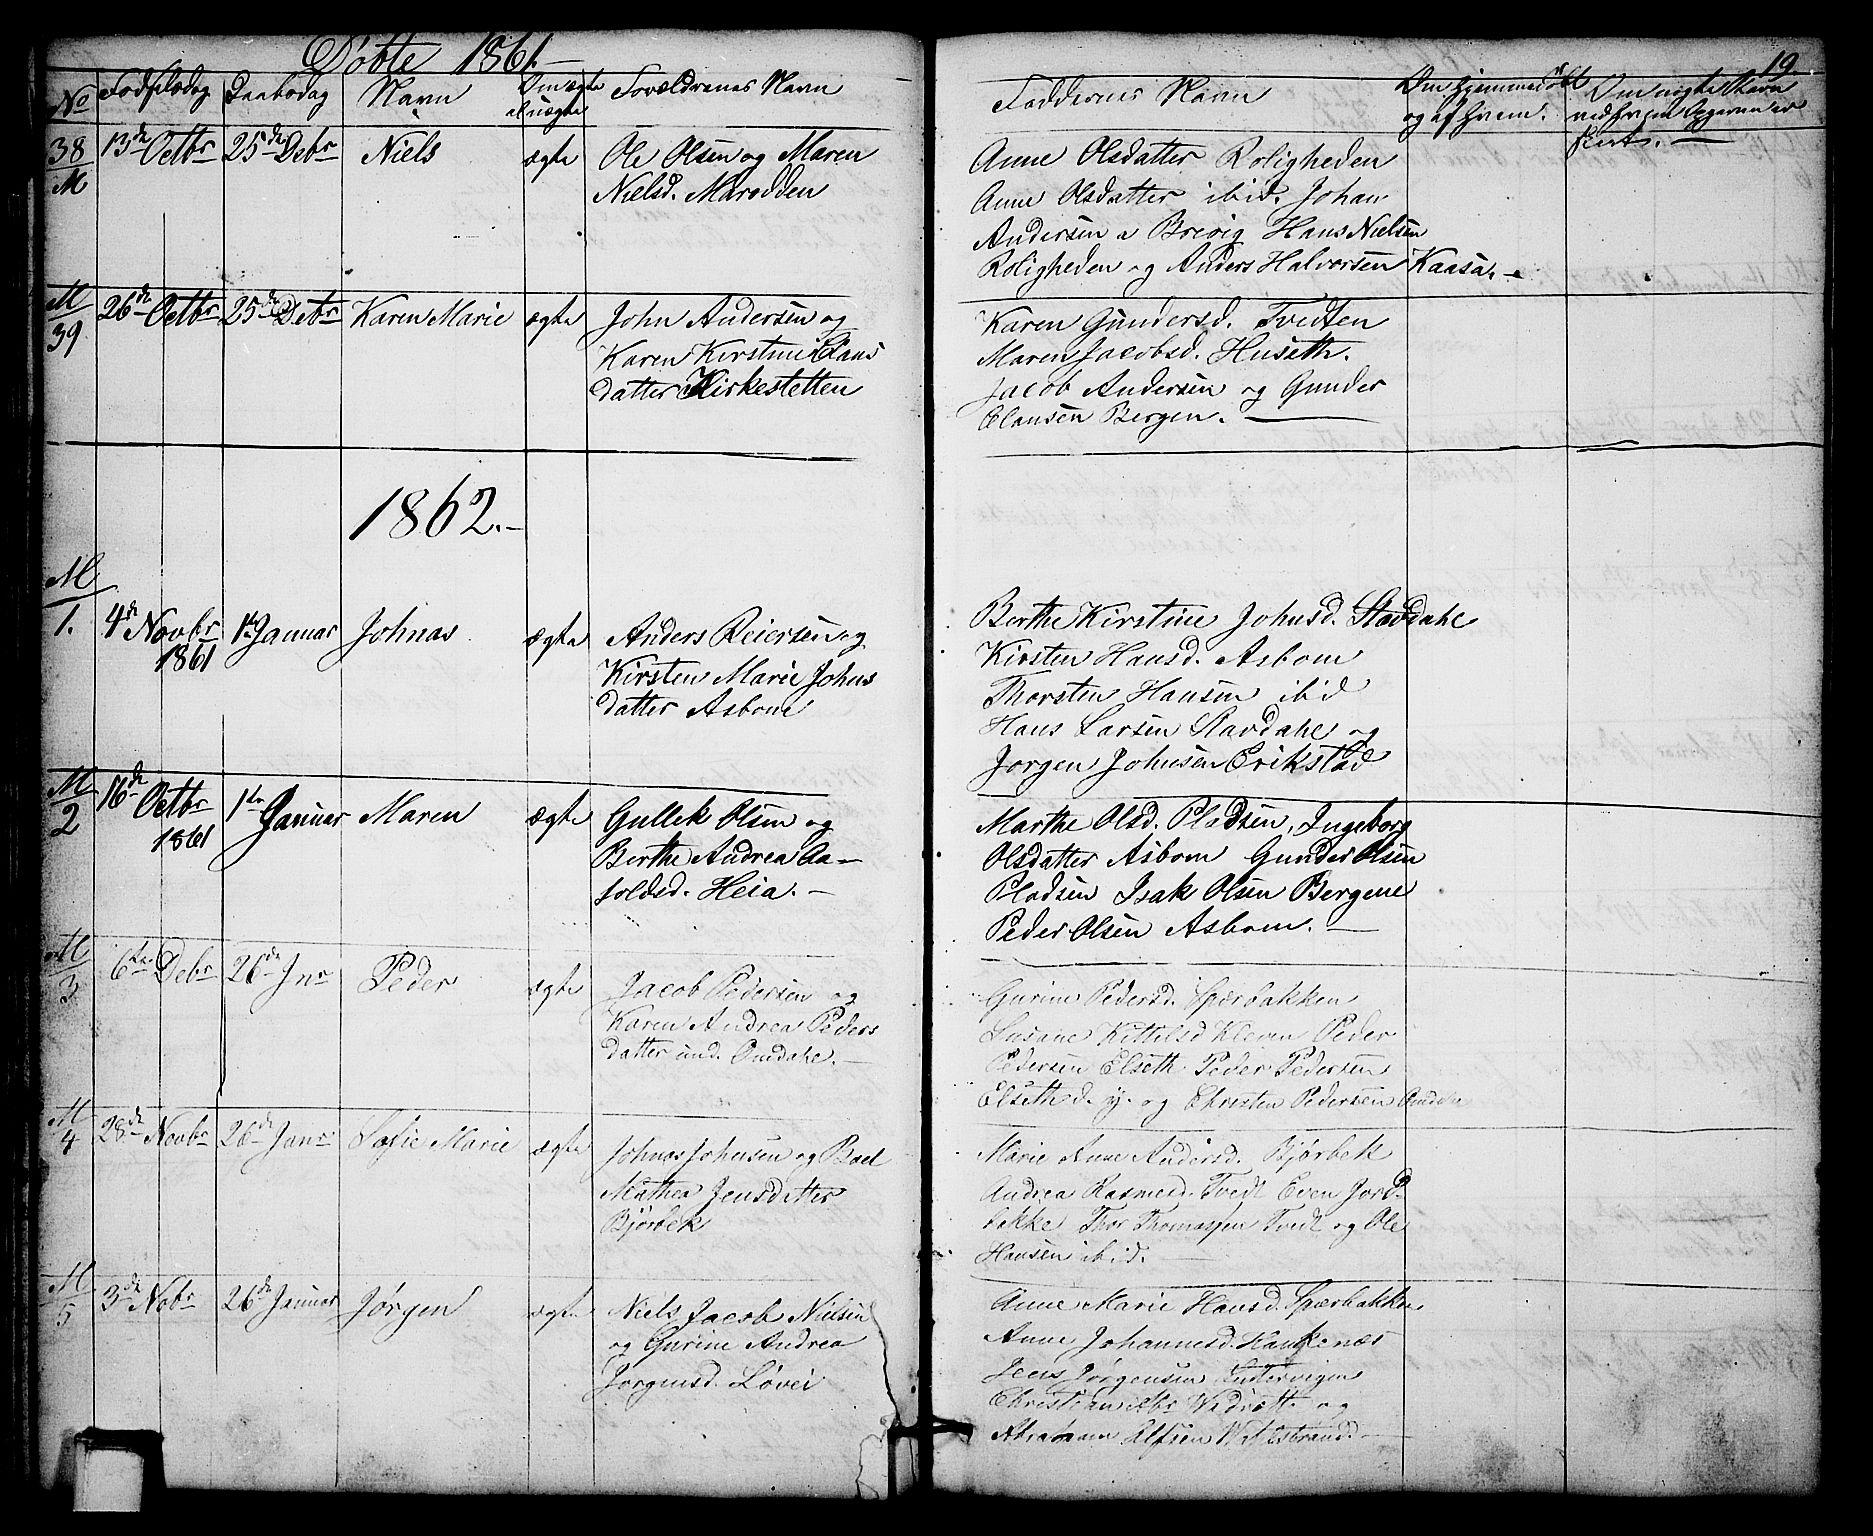 SAKO, Solum kirkebøker, G/Gb/L0002: Klokkerbok nr. II 2, 1859-1879, s. 19